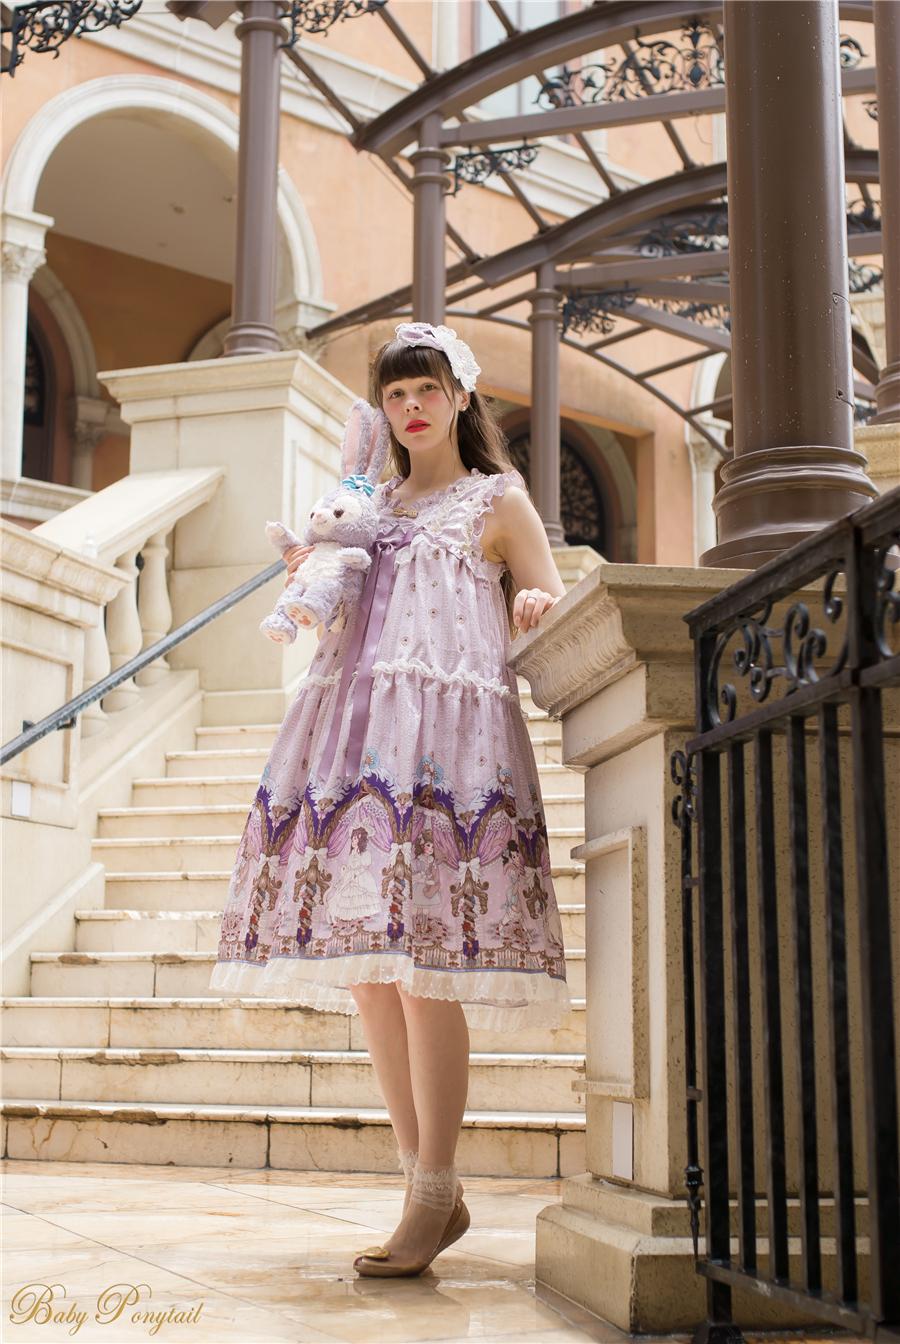 BabyPonytail_Model Preview_My Favorite Companion_Purple JSK_NG-3_Claudia_08.jpg